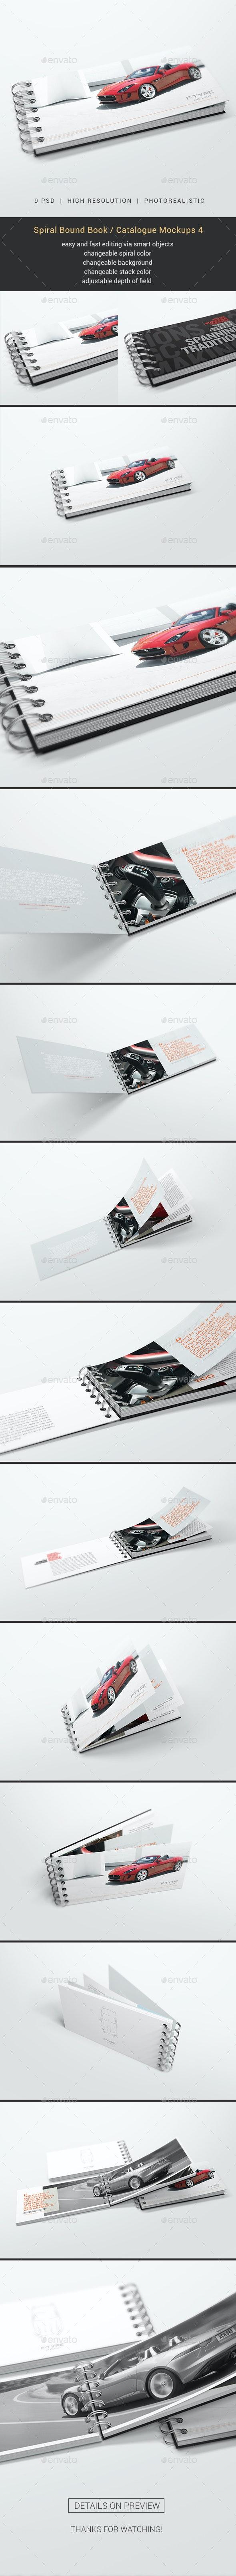 Spiral Bound Book / Catalogue Mockups 4 - Books Print